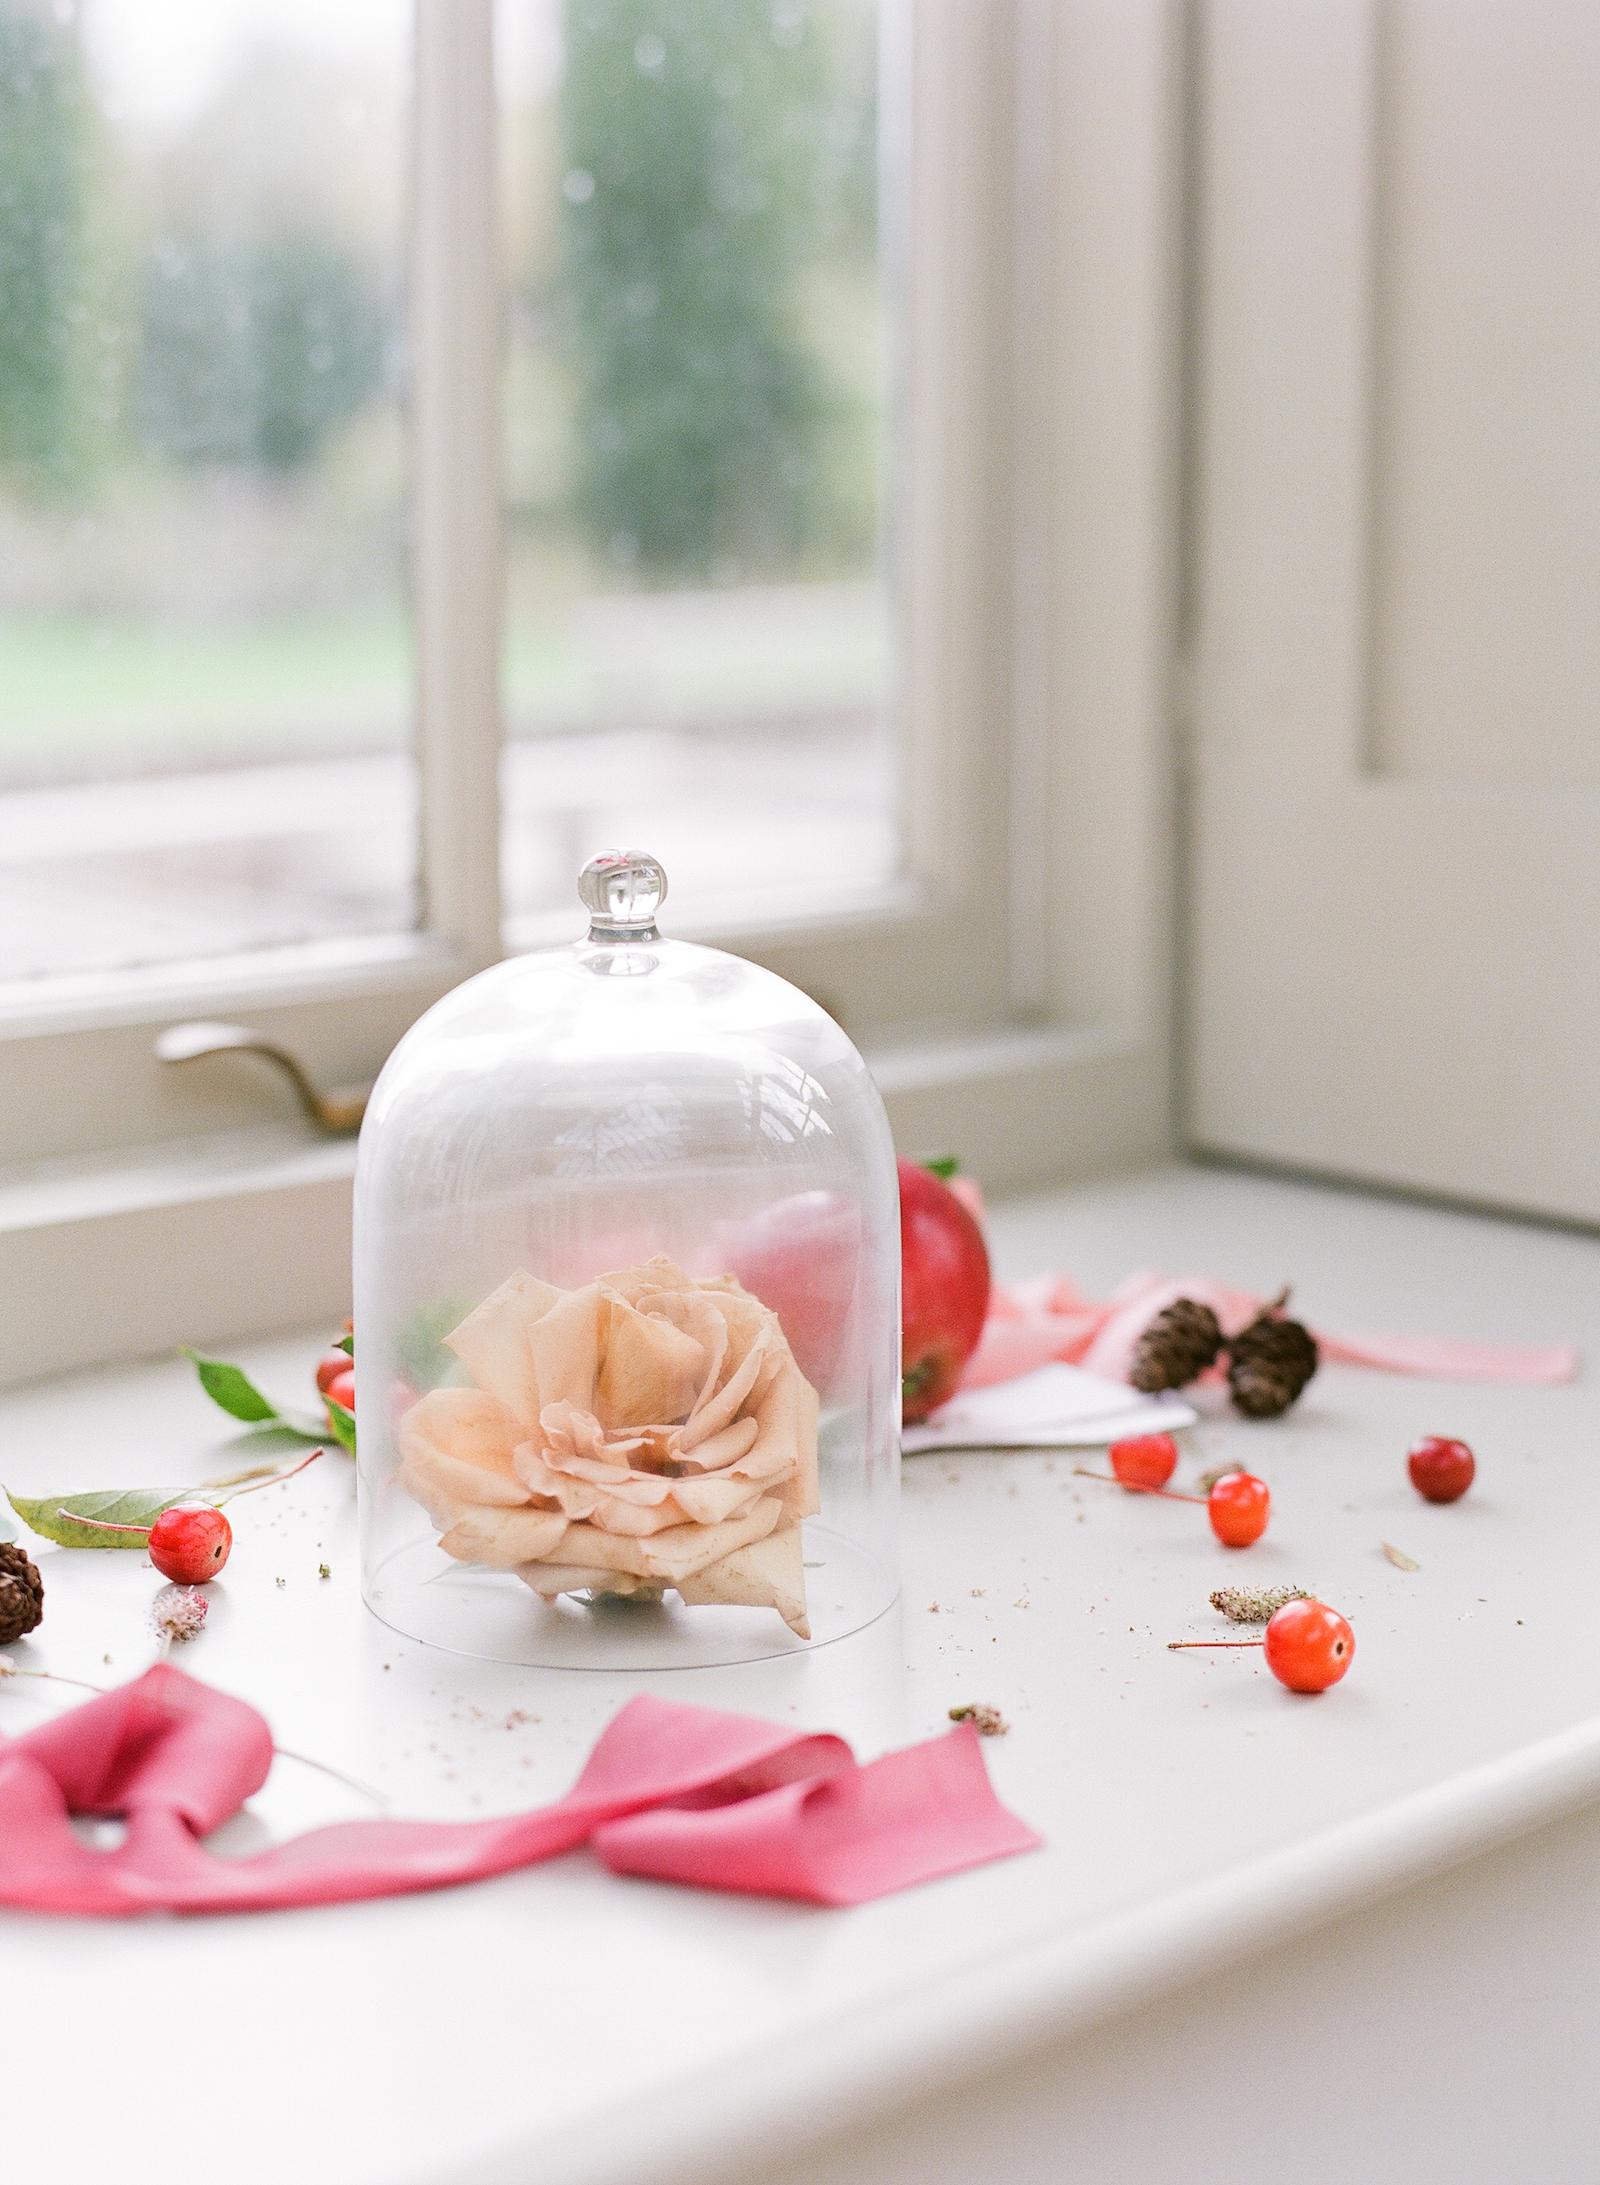 Luxury Wedding Planner UK, London & Europe | A Feminine & Refined Autumn Wedding Inspiration | English Manor Country Autumn Wedding Moody Romantic Warm Velvet Black Red and Peach Tones | Molly Carr Photography41.JPG